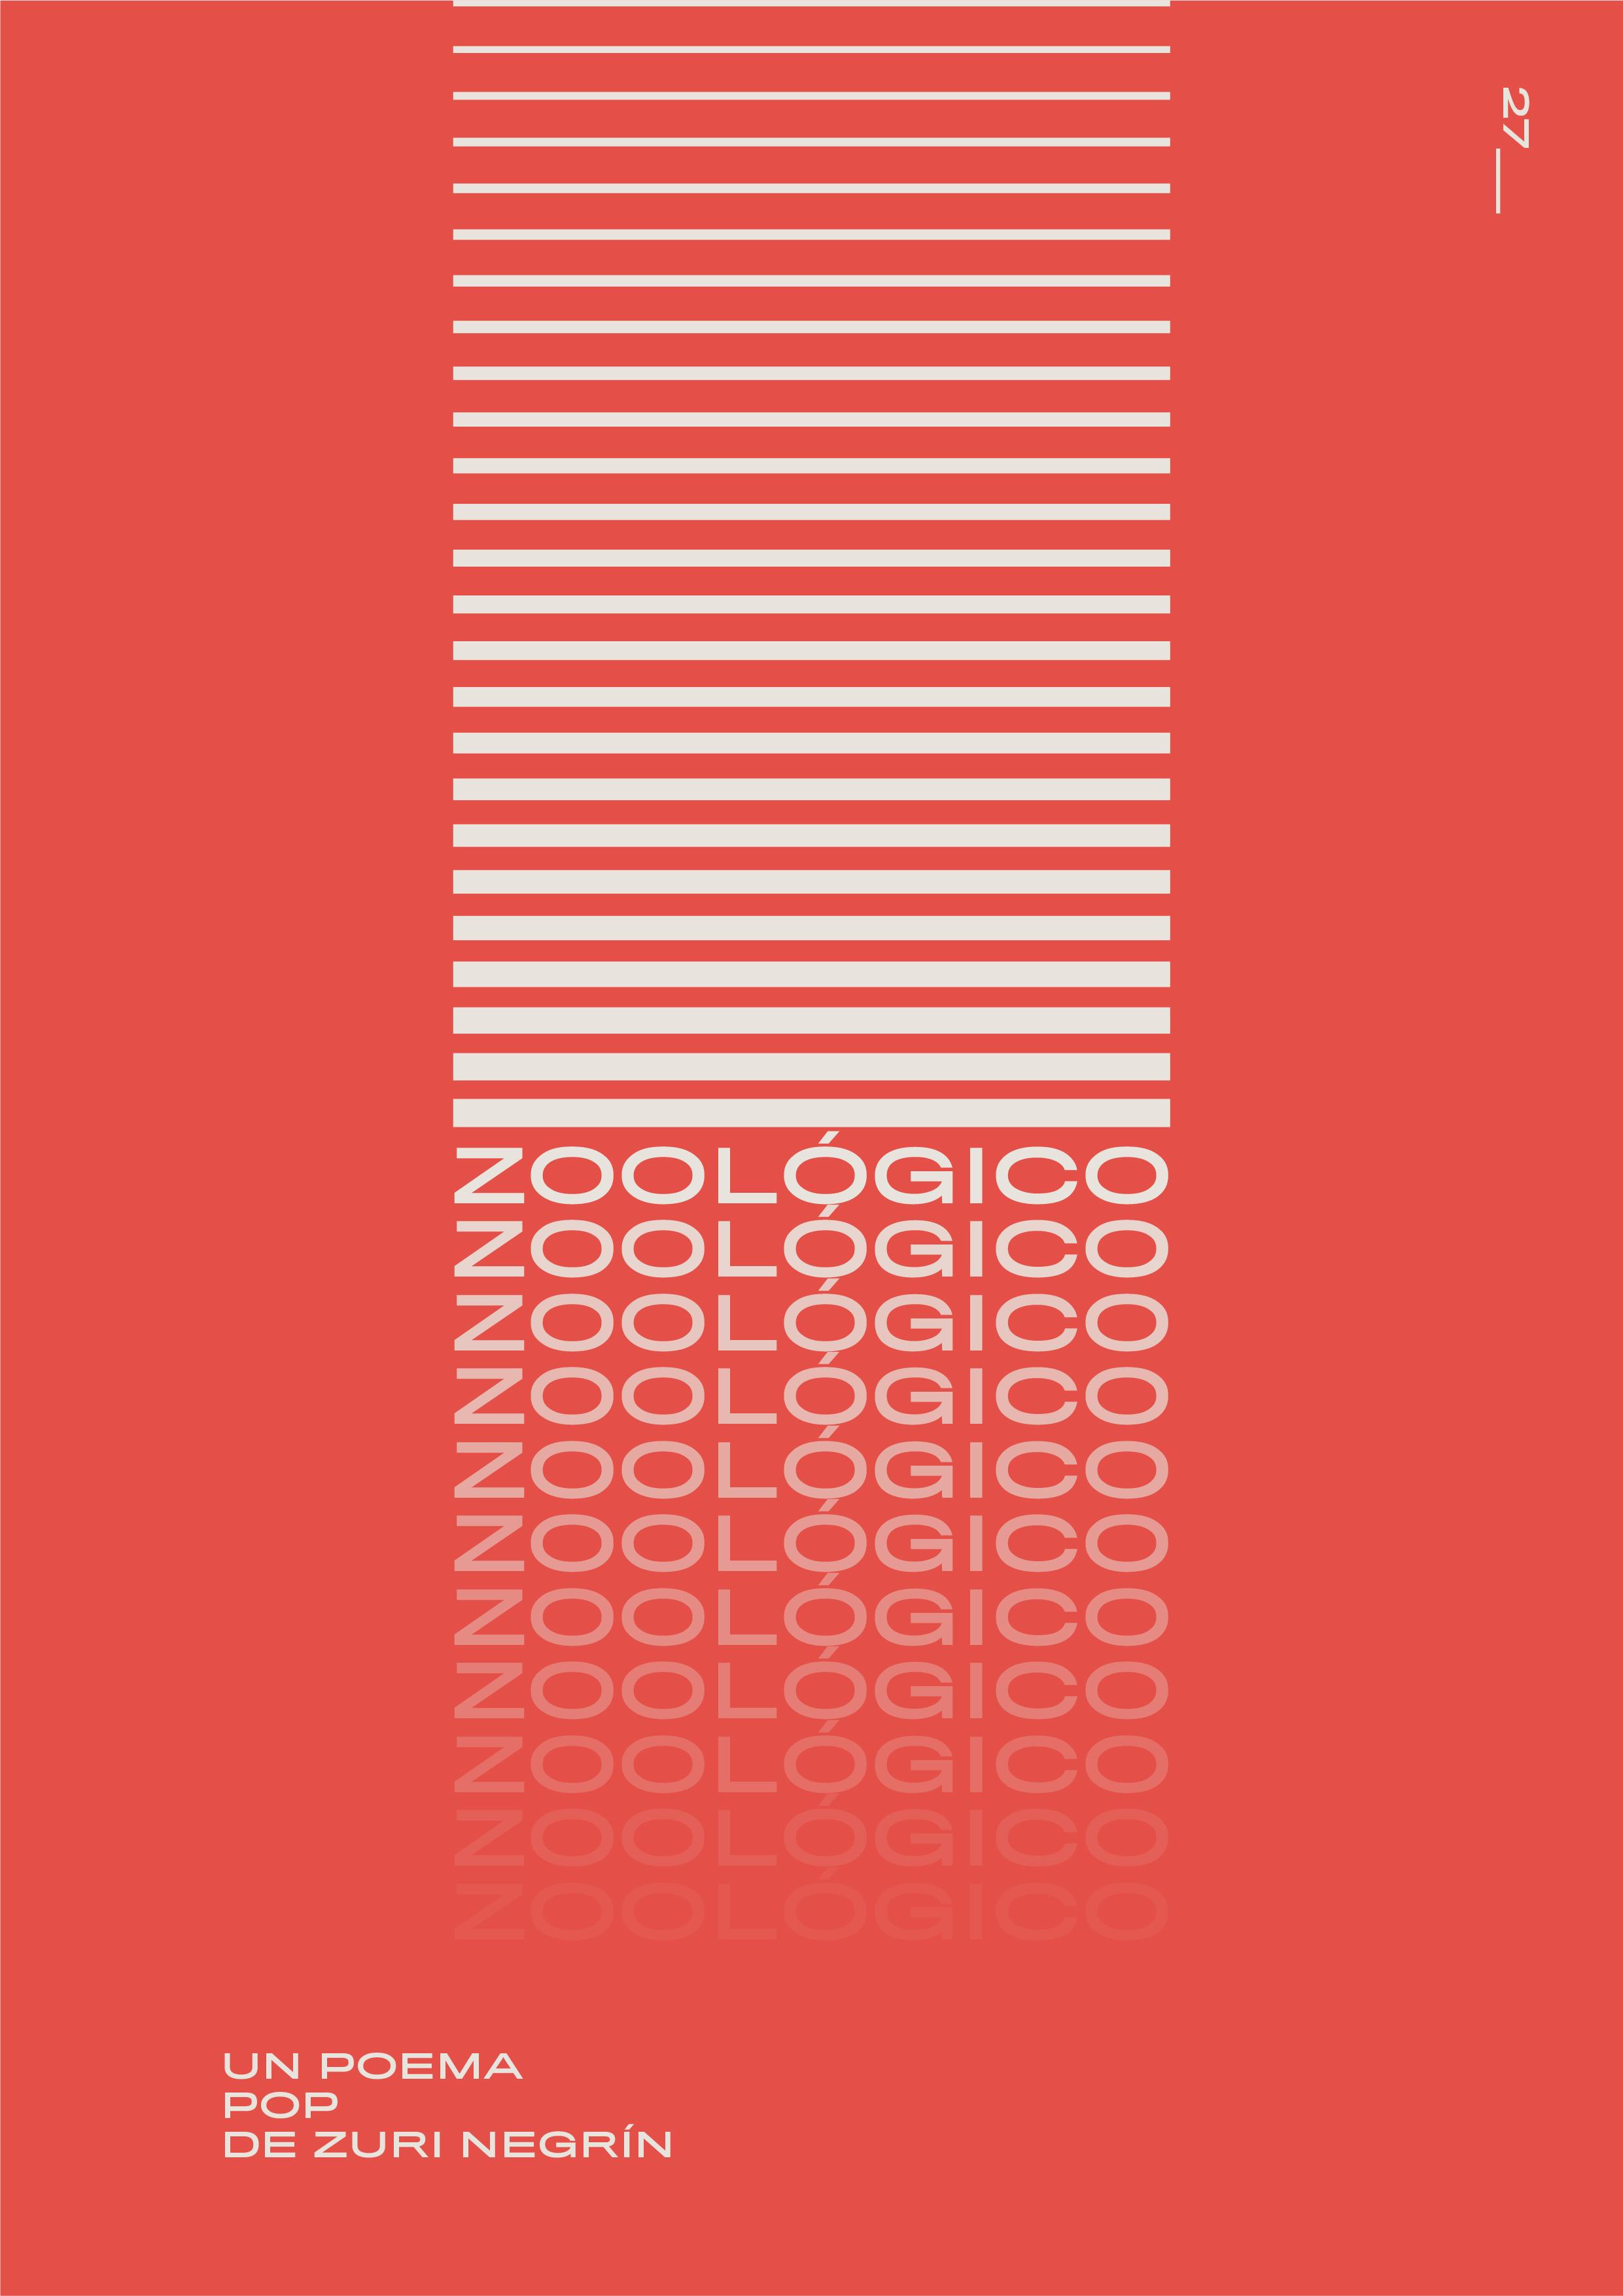 POP_27 Zoológico